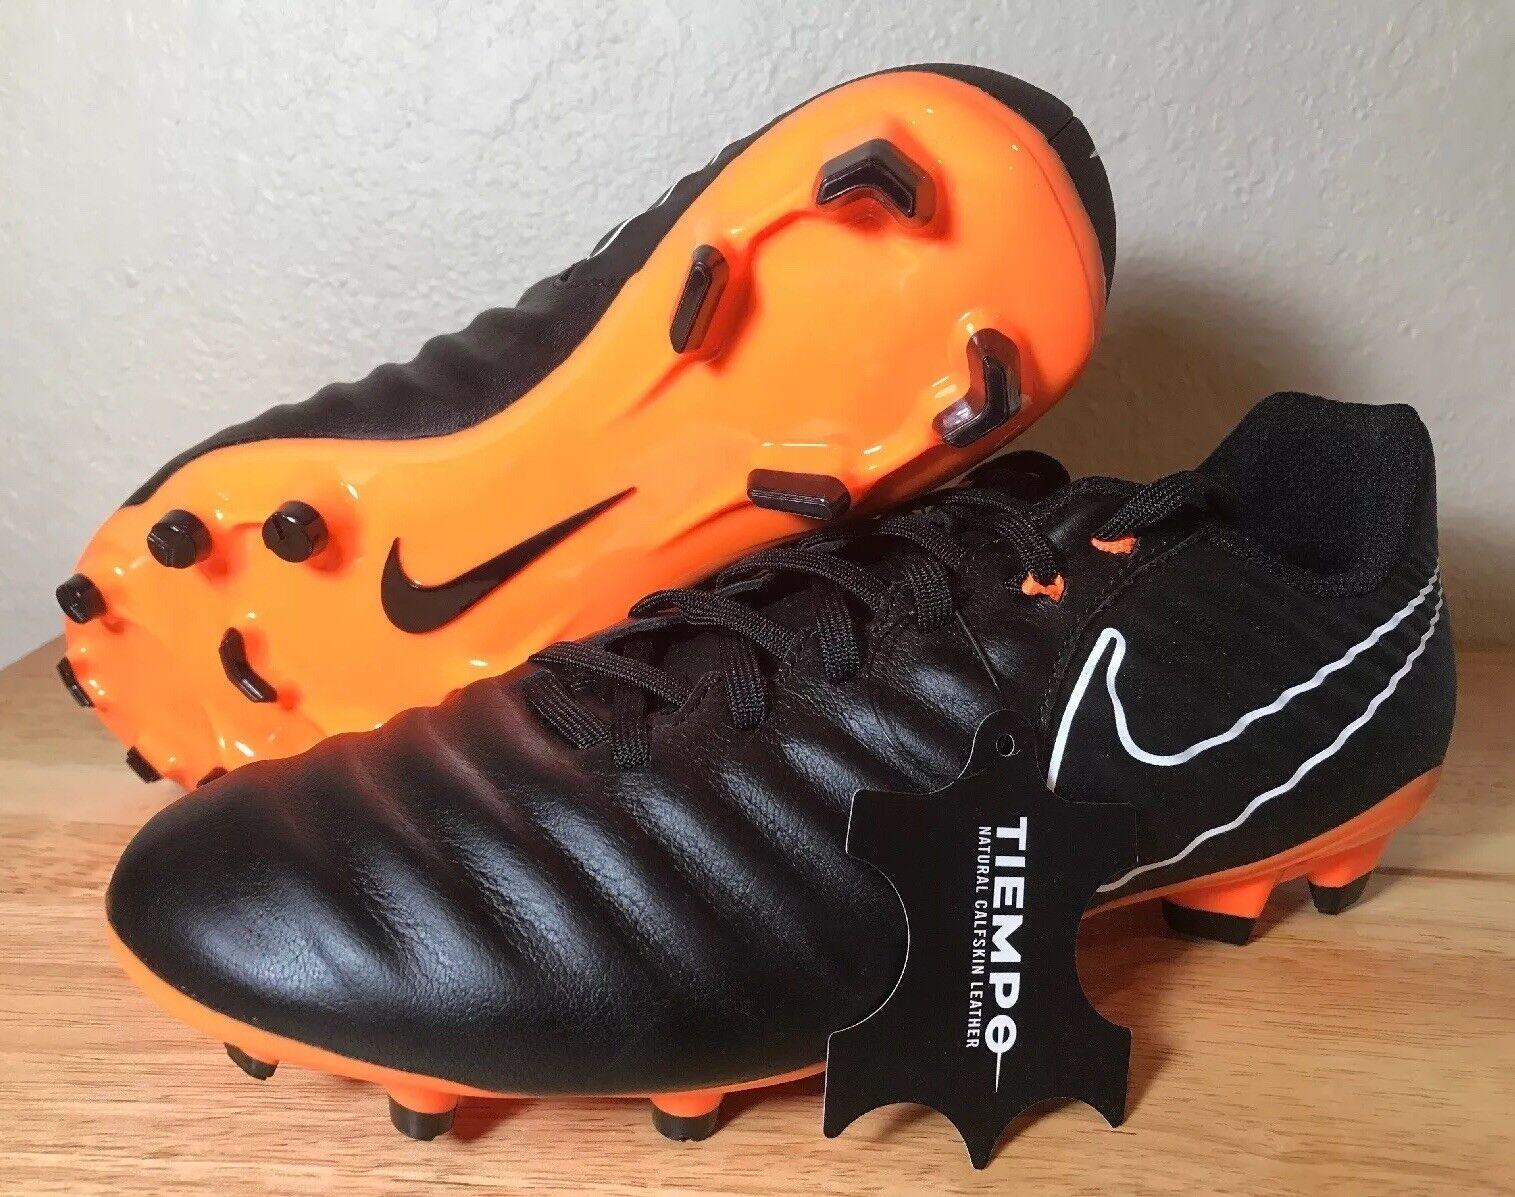 Nike Tiempo Legend VII 7 Academy FG Size 6 Black orange Soccer Cleats AH7242-080